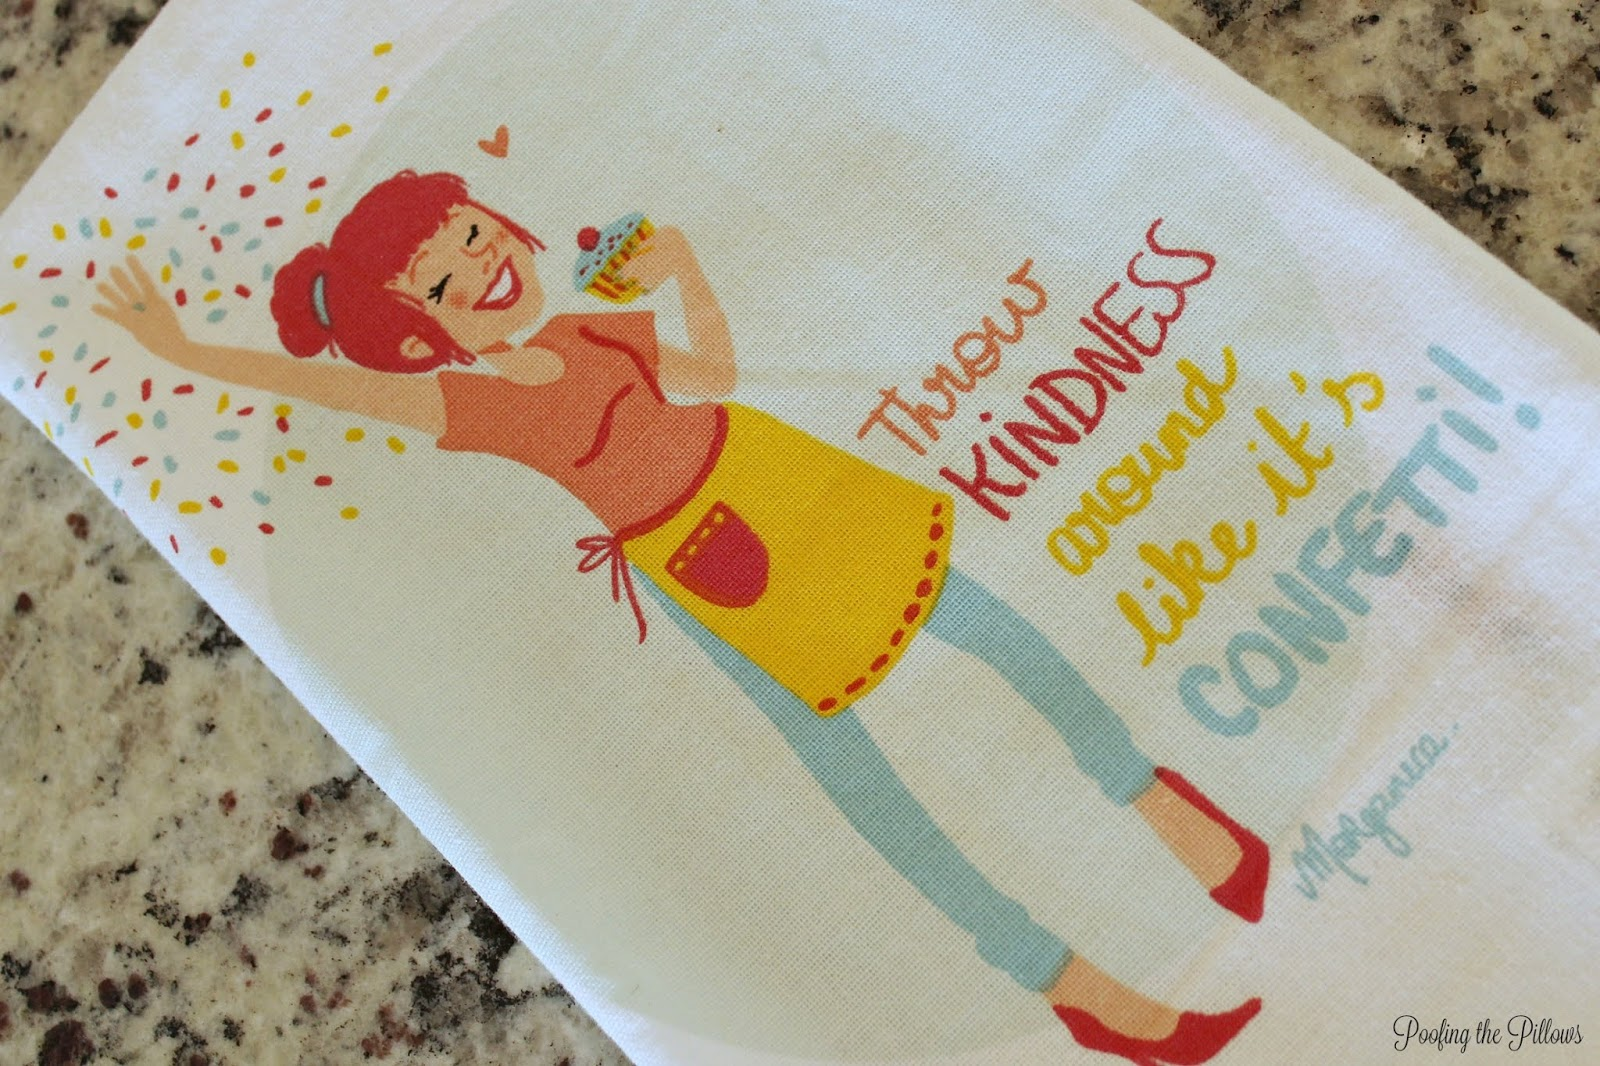 #throwkindnesslikeconfetti